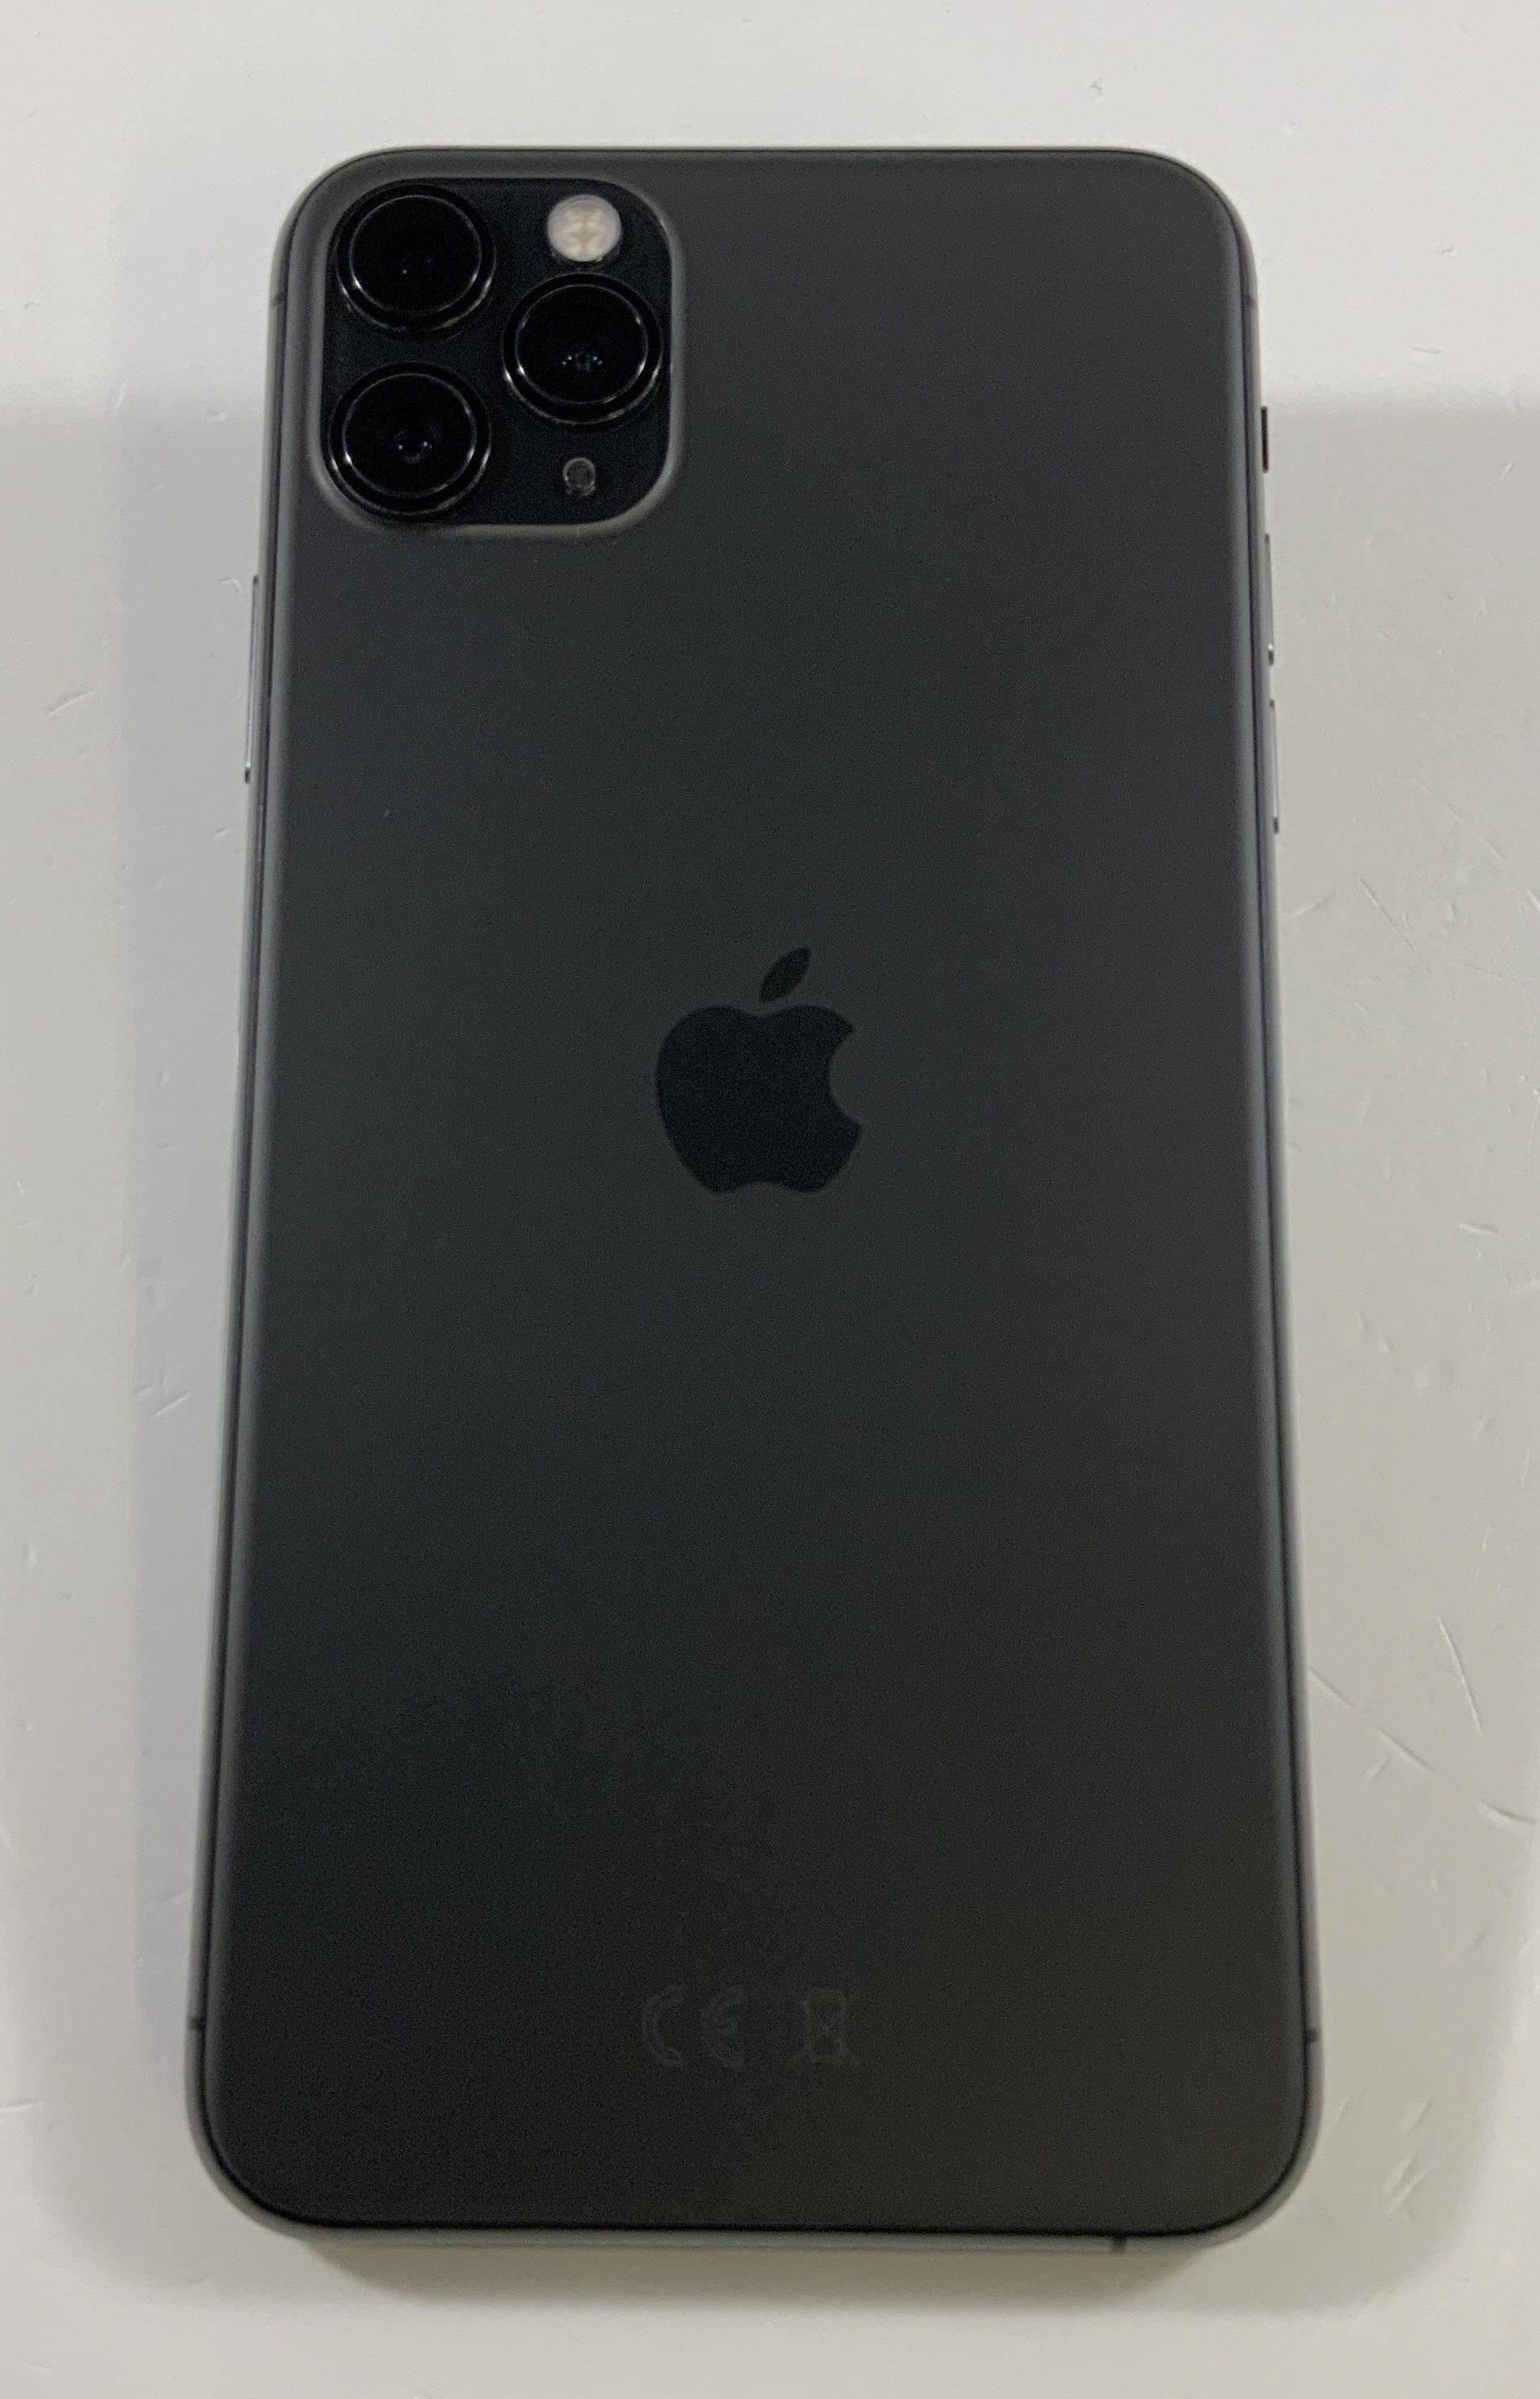 iPhone 11 Pro Max 256GB, 256GB, Space Gray, obraz 2